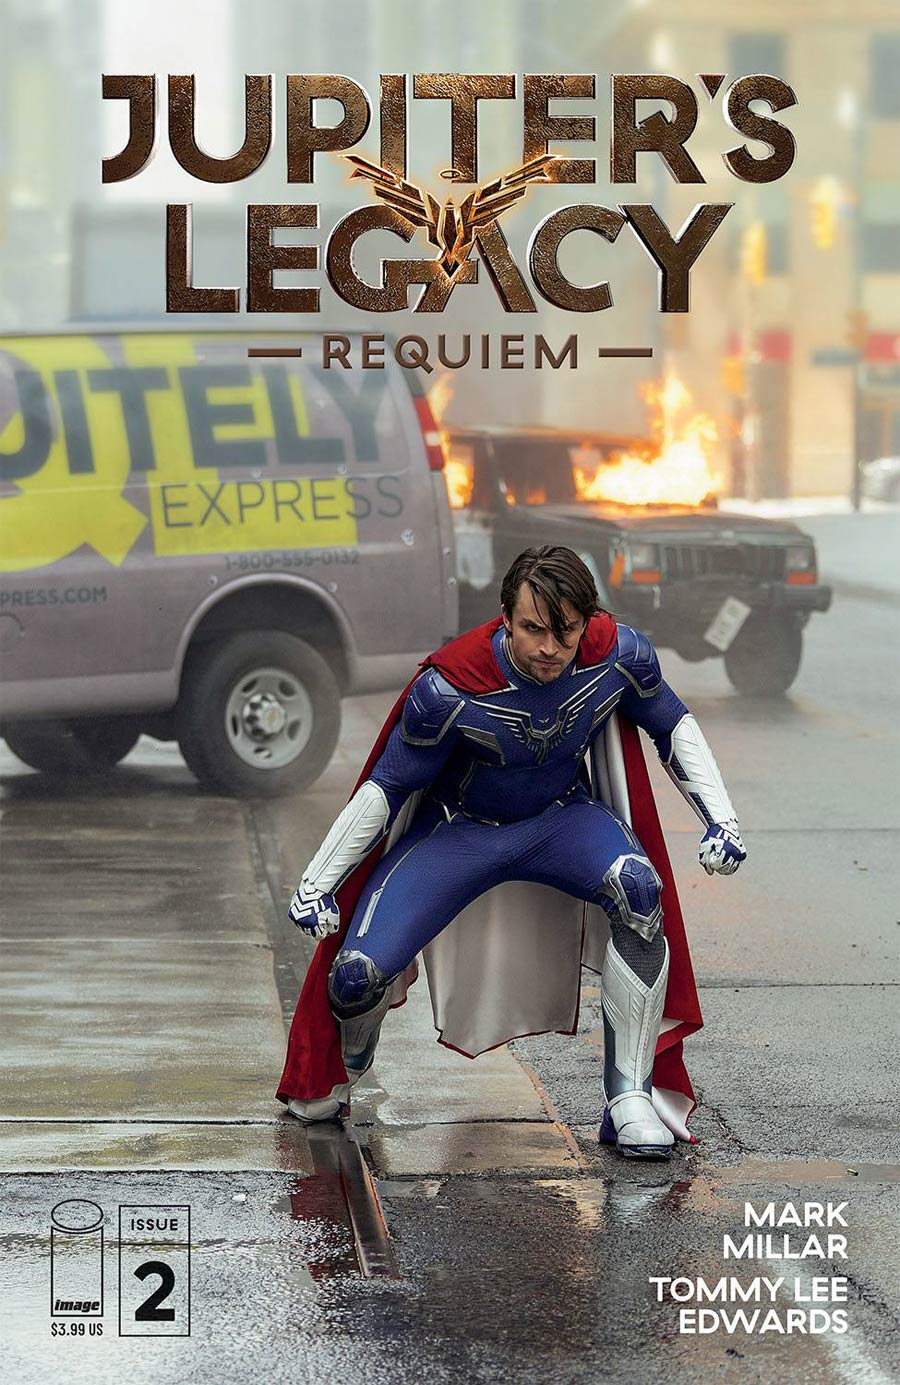 Jupiters Legacy Requiem #2 Cover D Variant Netflix Photo Cover